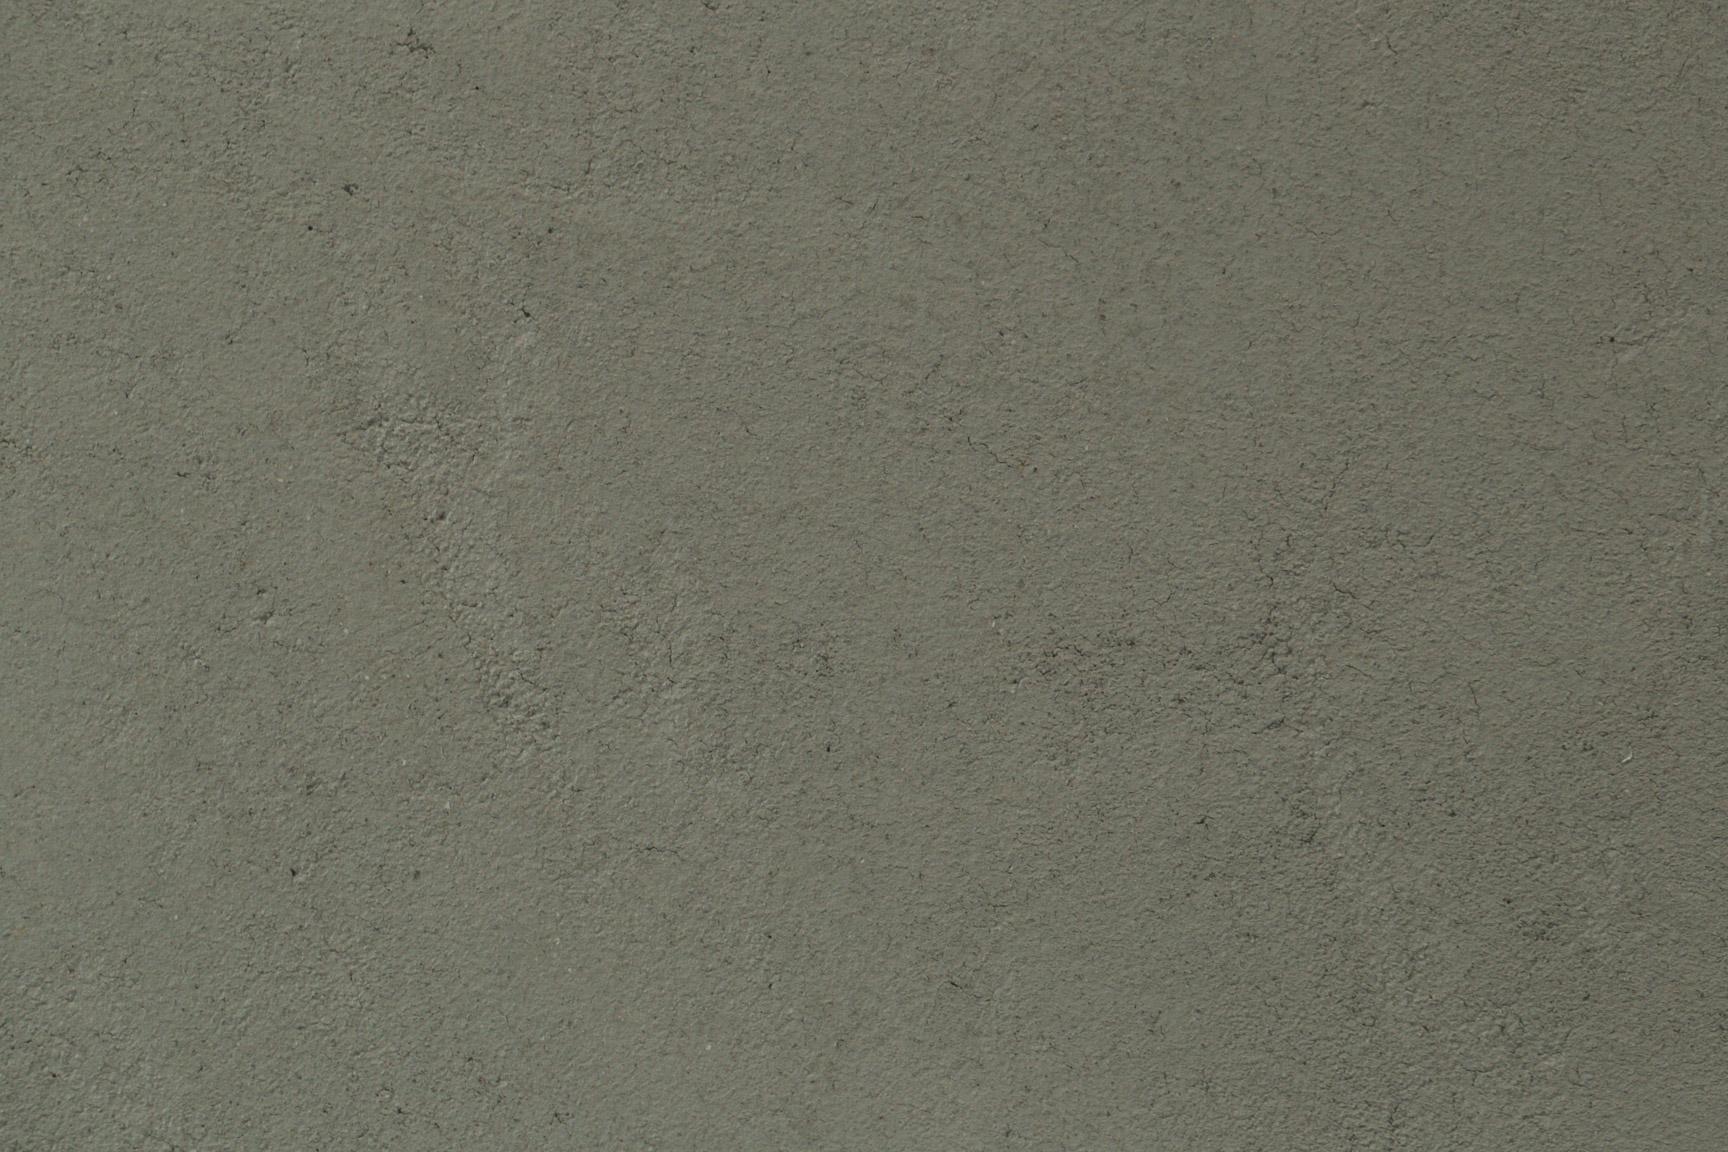 surfacedesign-44.jpg